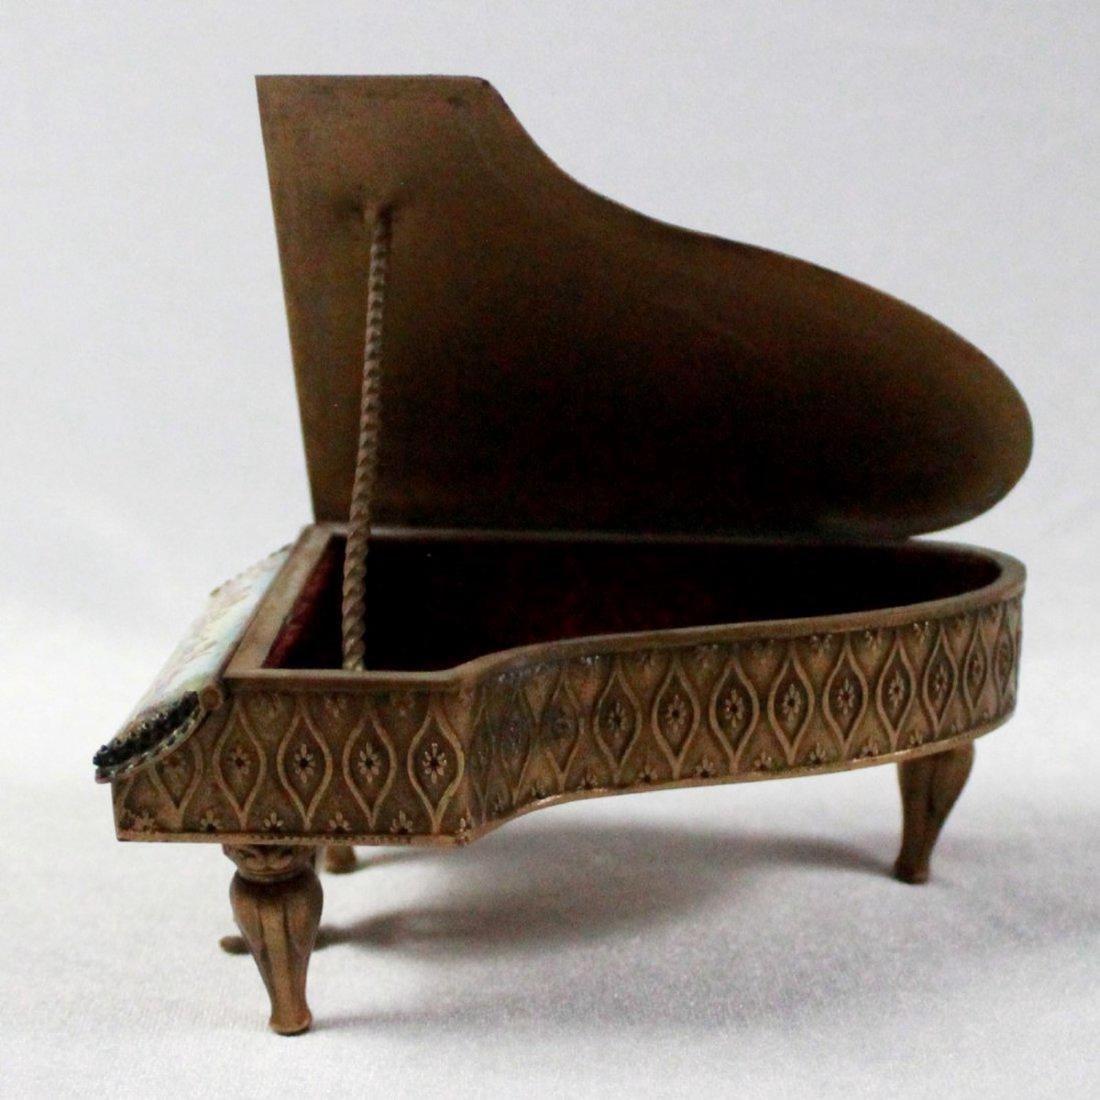 19Th C Viennese Enamel Miniature Piano - 6